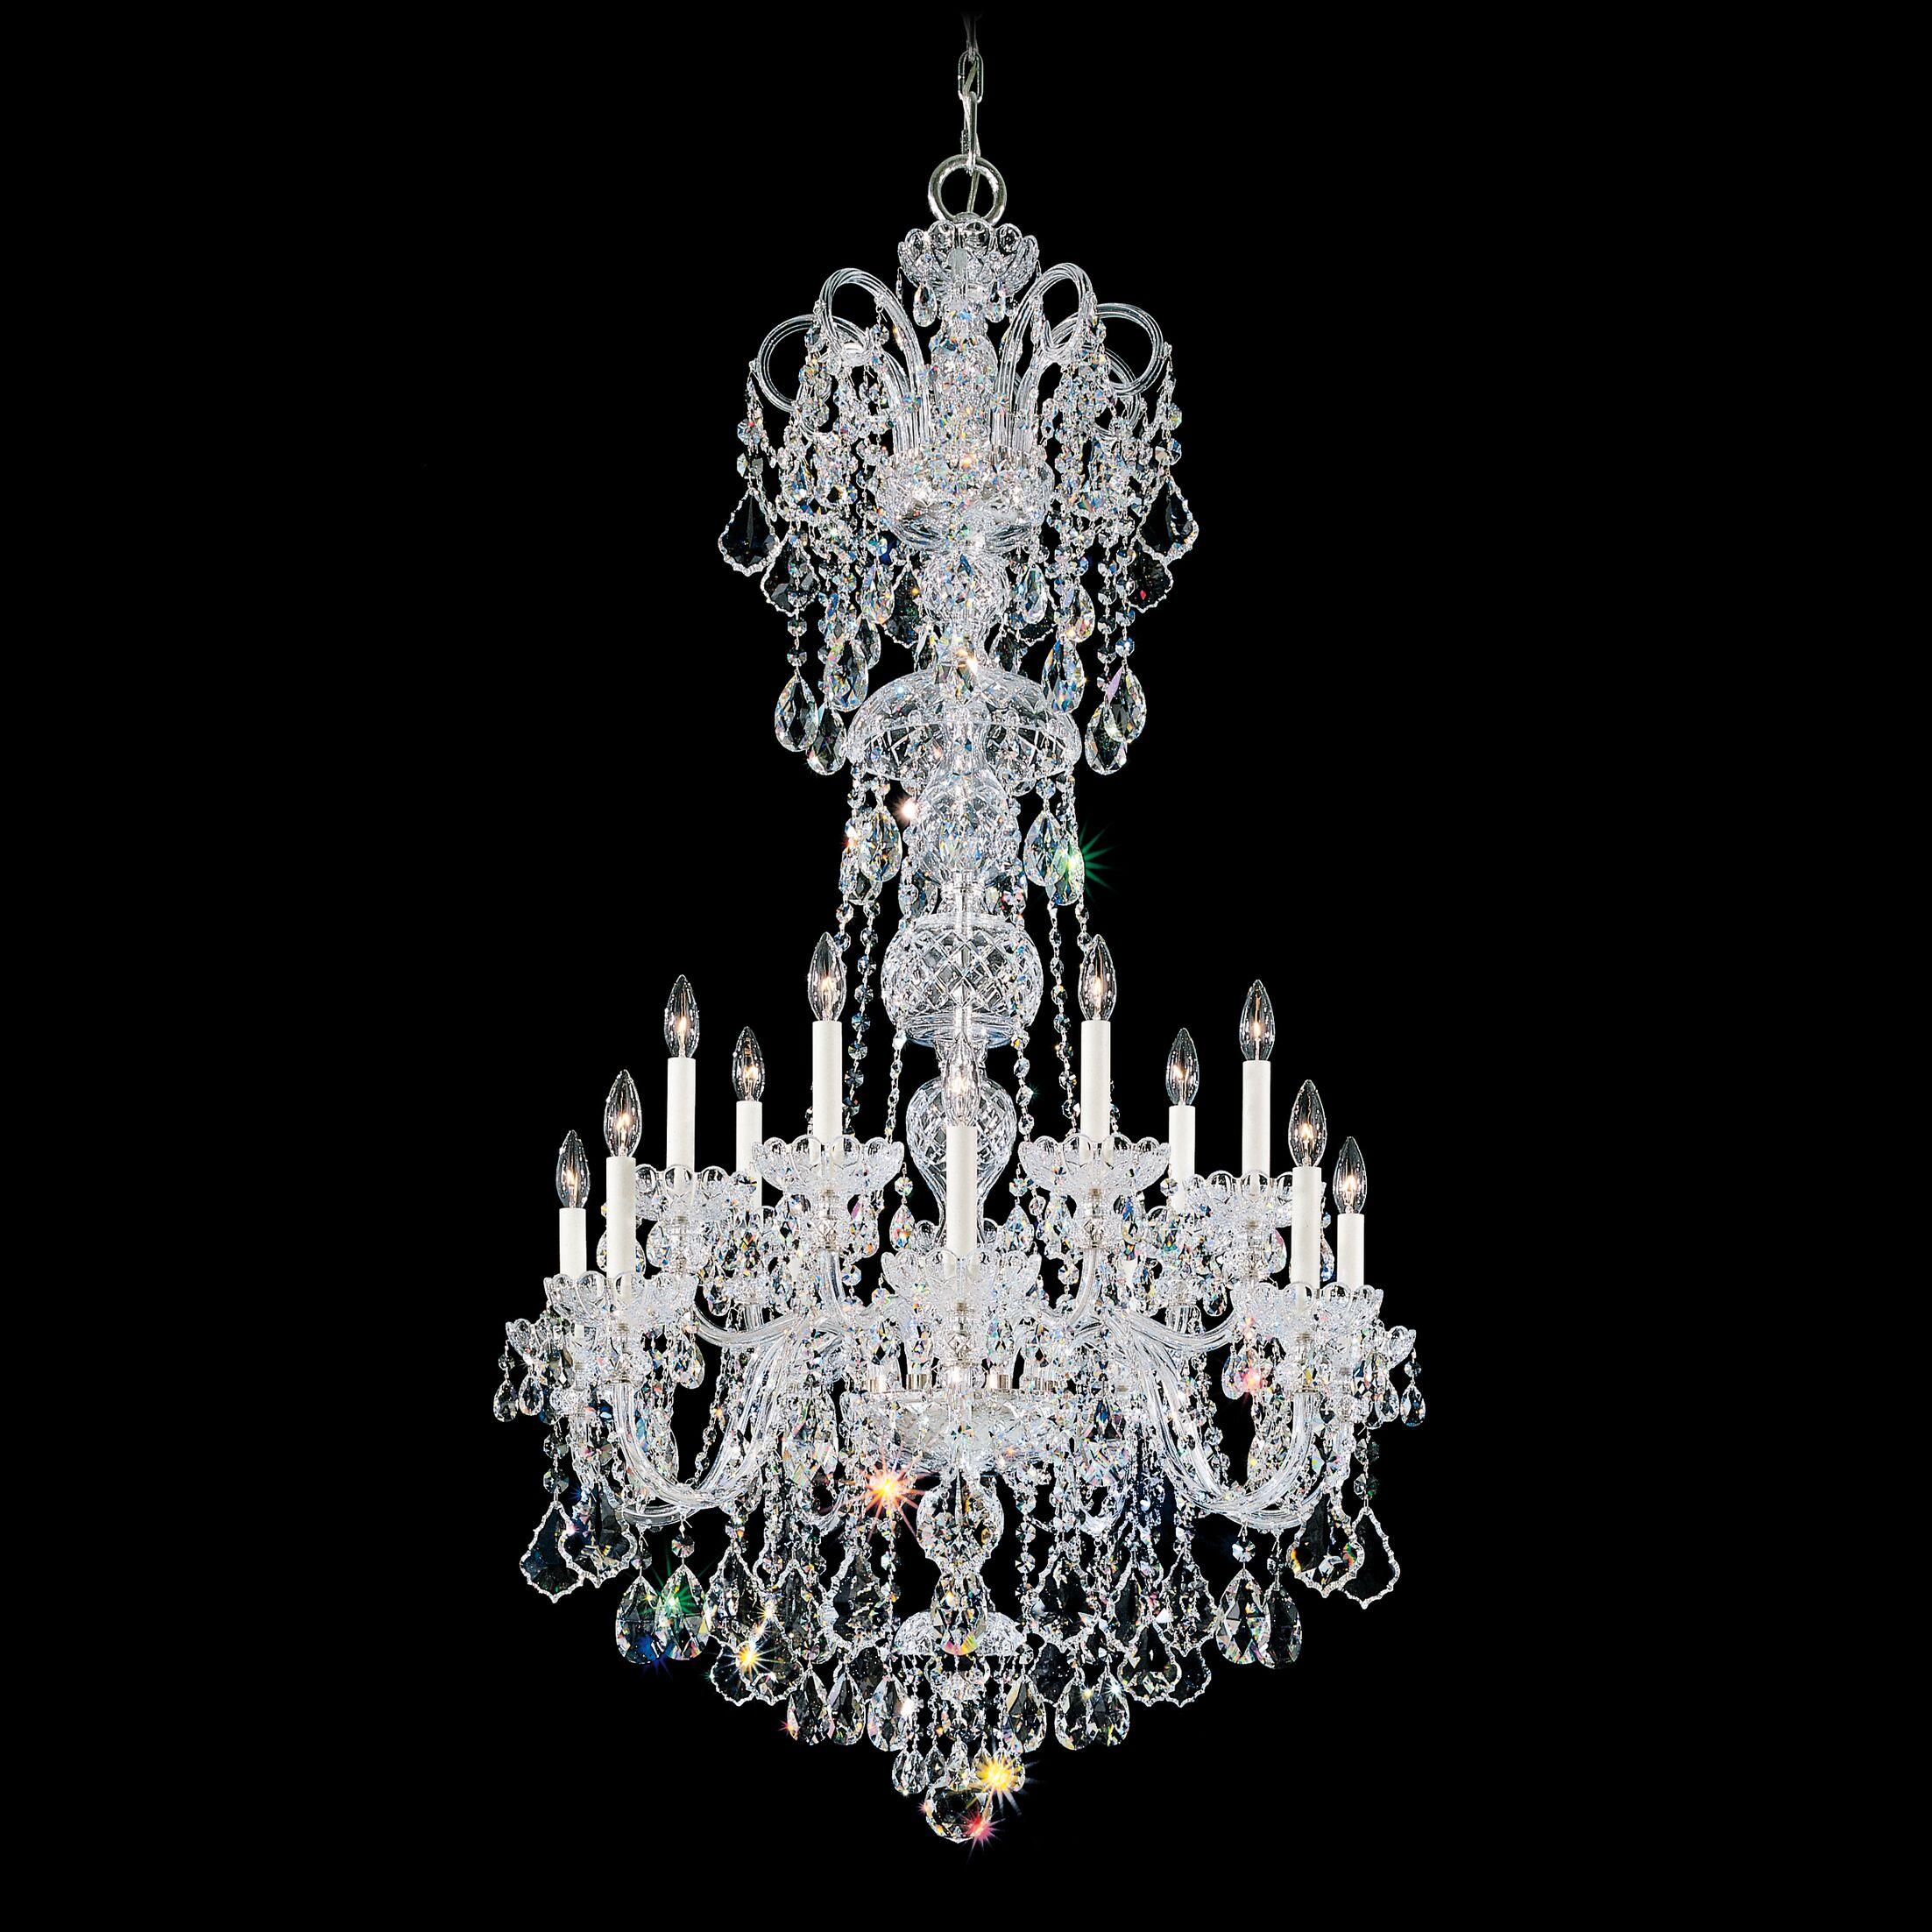 Olde World 14-Light Chandelier Color / Crystal Color: Silver / Strass Clear